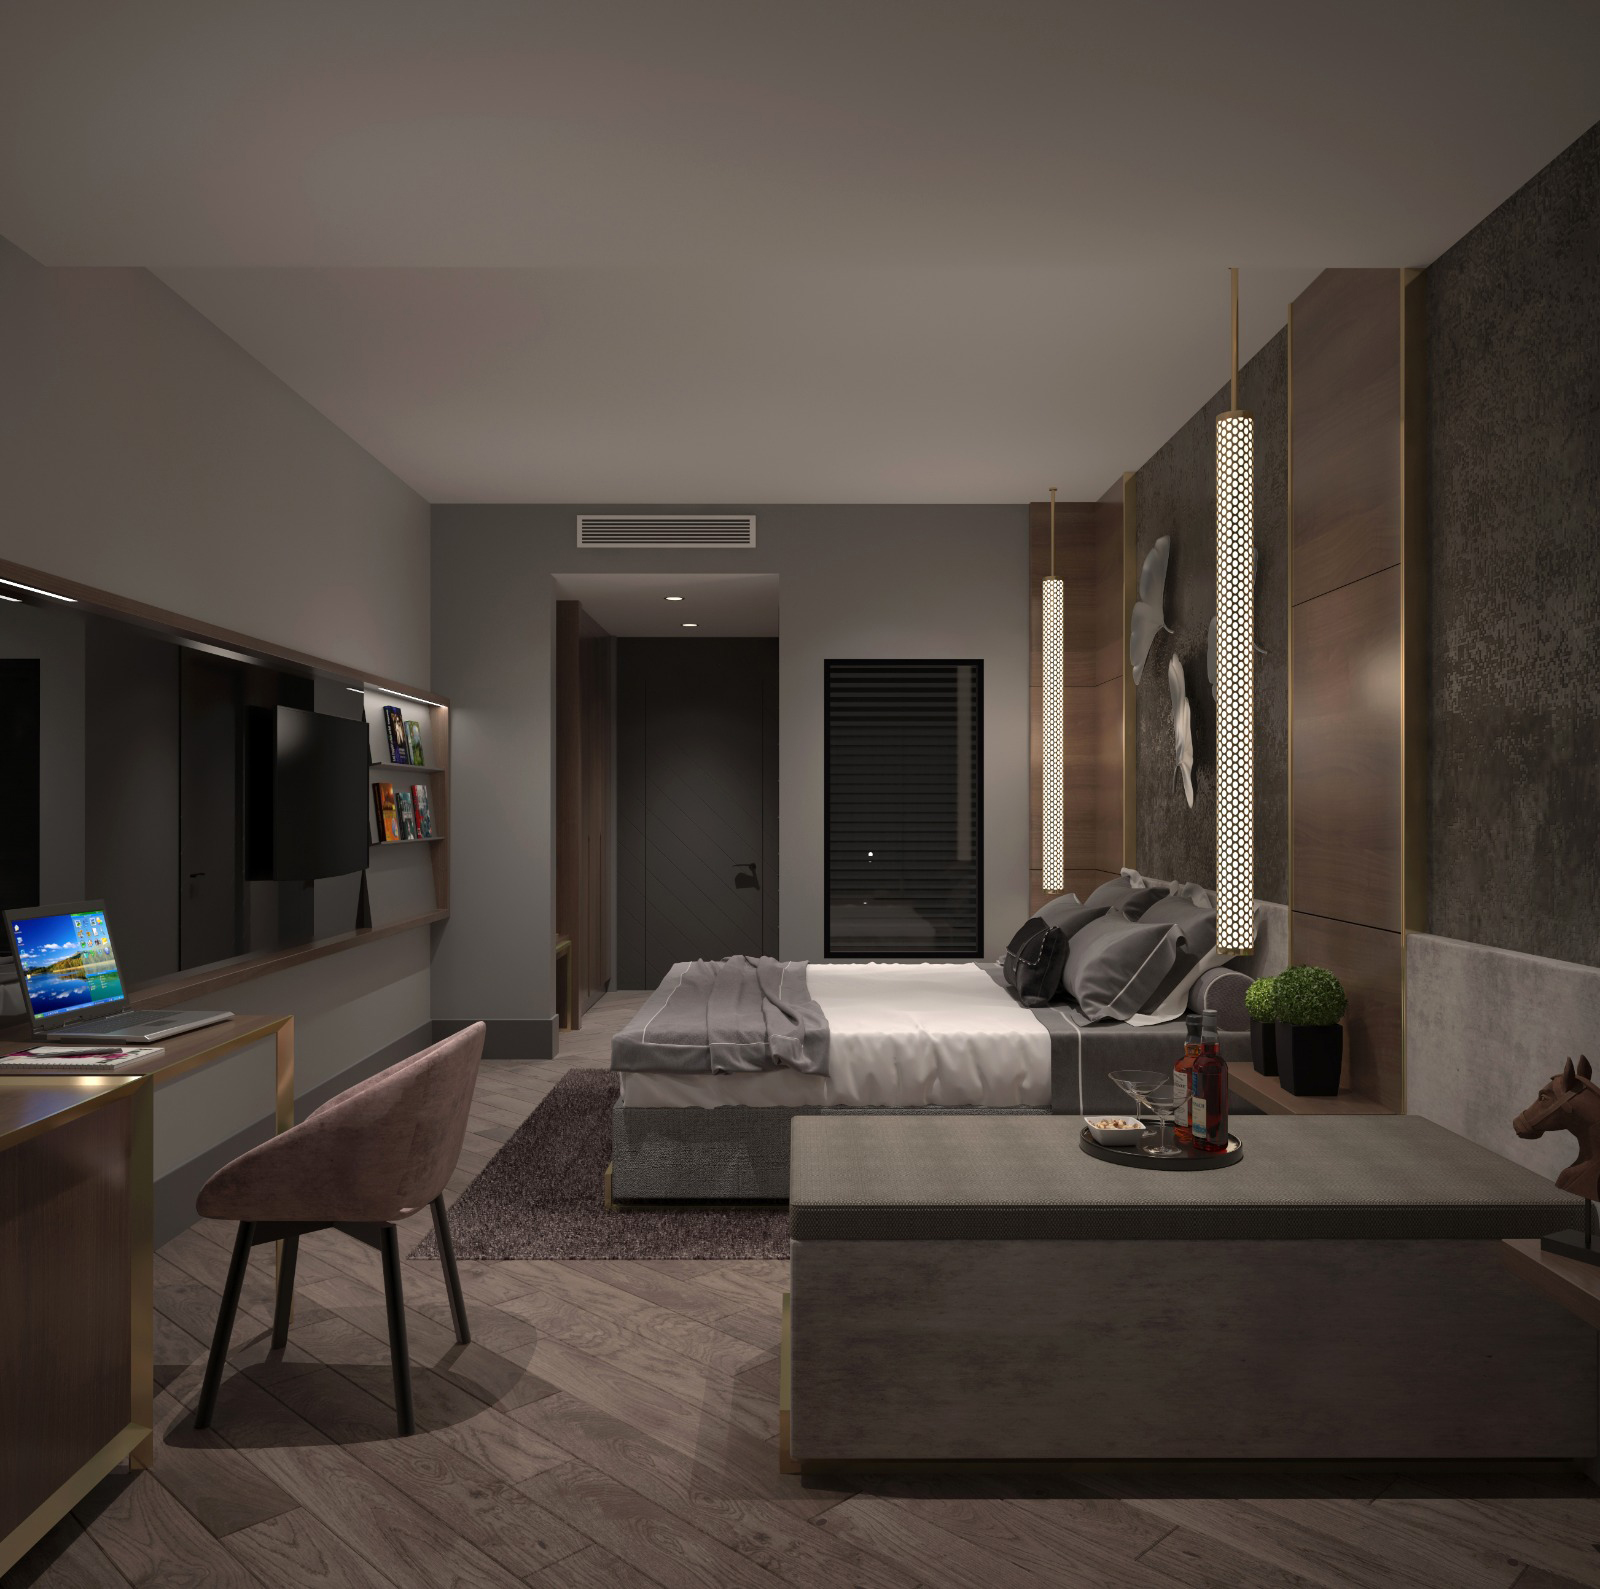 Penthouse Hotel